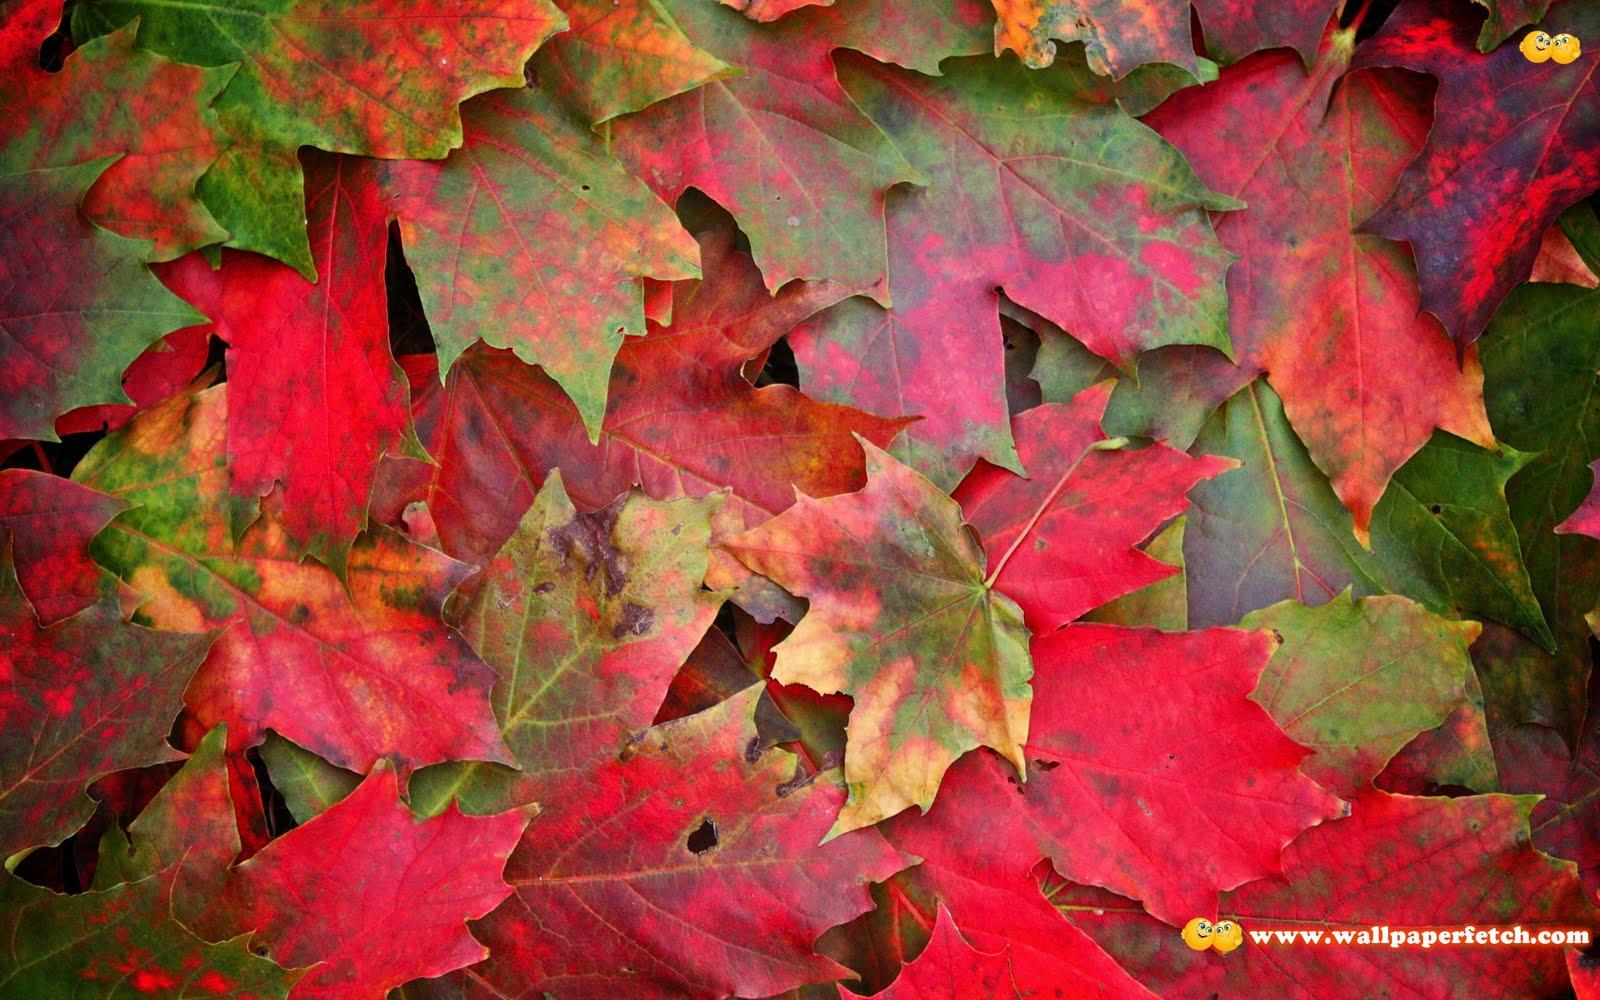 http://4.bp.blogspot.com/-XzLDiIYd7C4/TrxDRXZ4rQI/AAAAAAAAJfQ/dxH3qVT1j9Q/s1600/SuperPack_Beautiful_Nature_HD_Wallpapers_Part__80.58.jpg